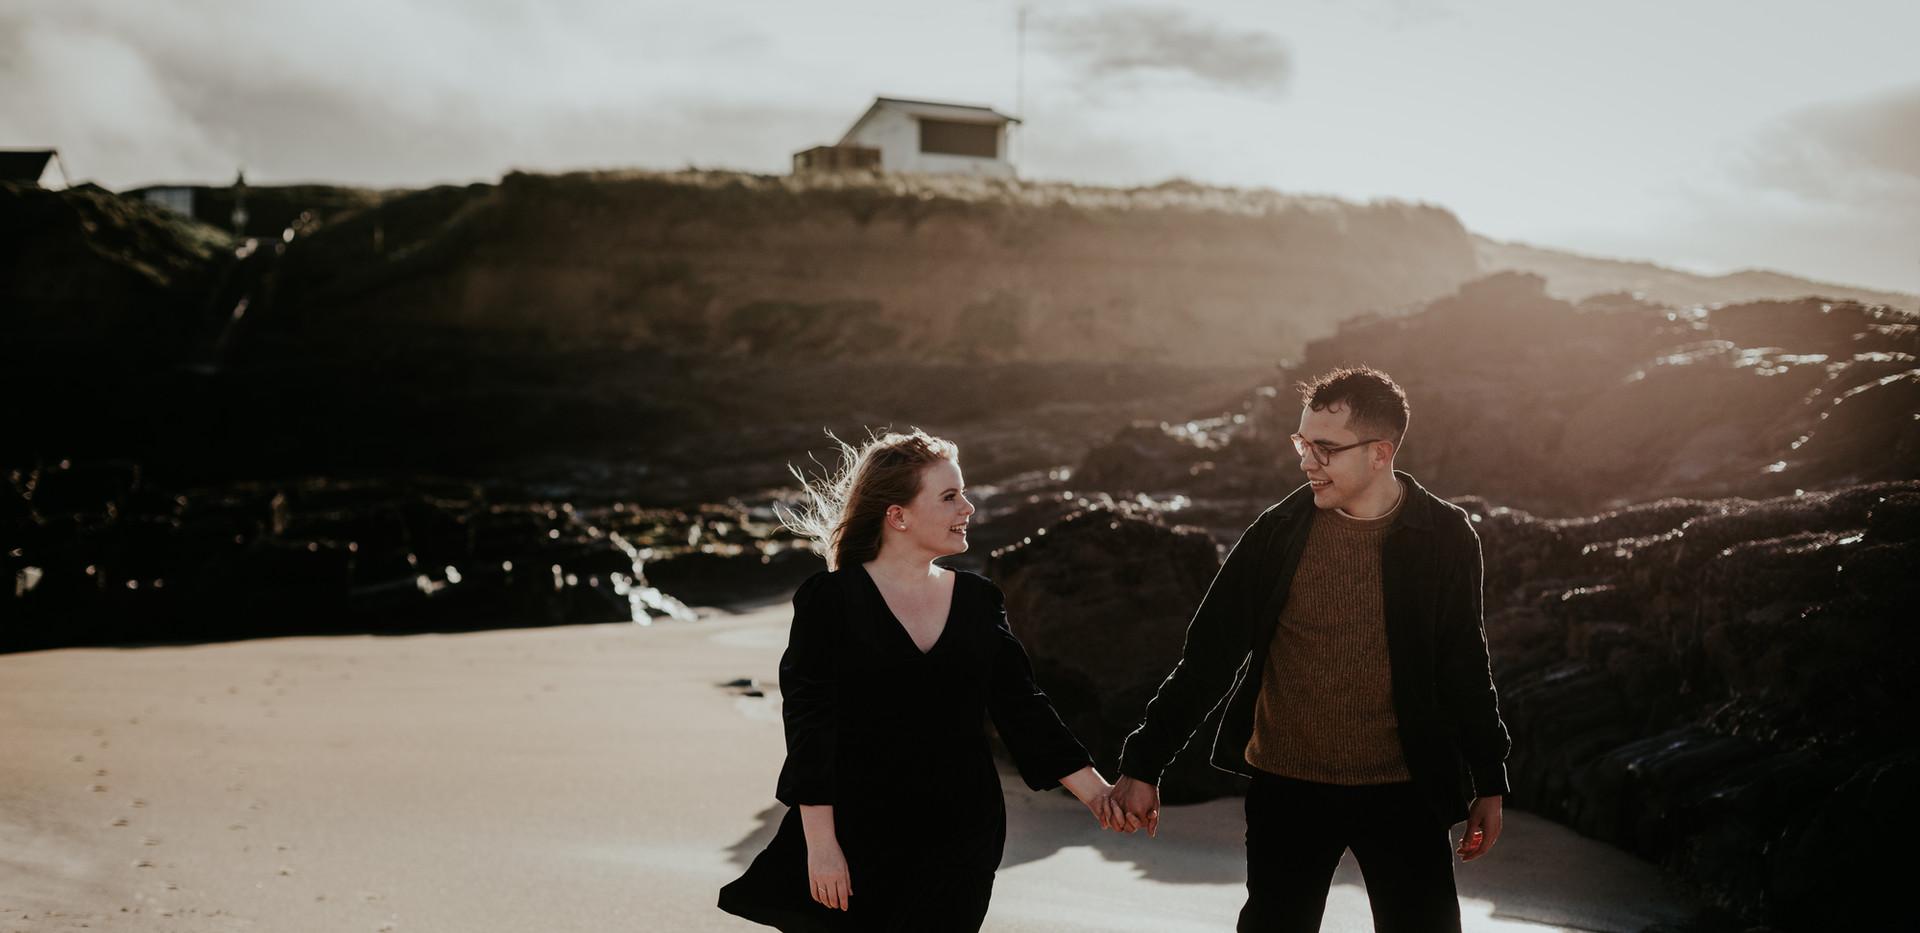 cornwall-elopement-photography-6.jpg